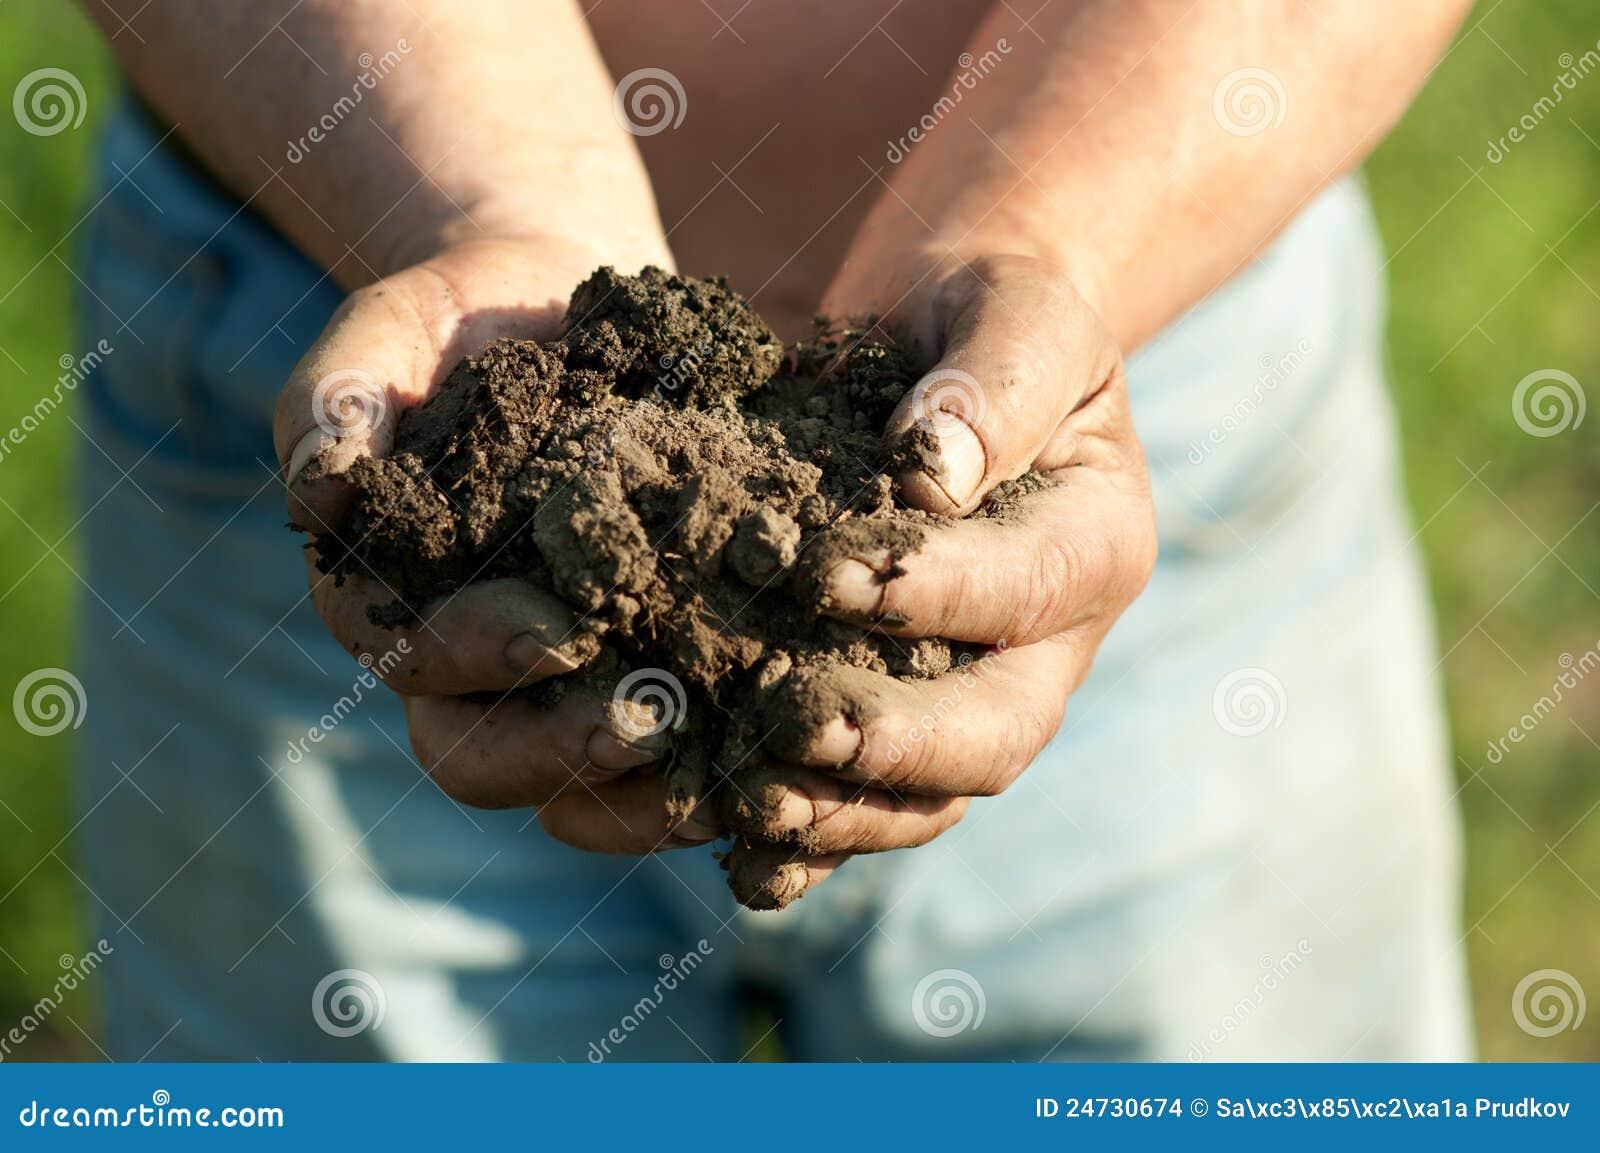 Farmer holding lump of wet soil in his hands